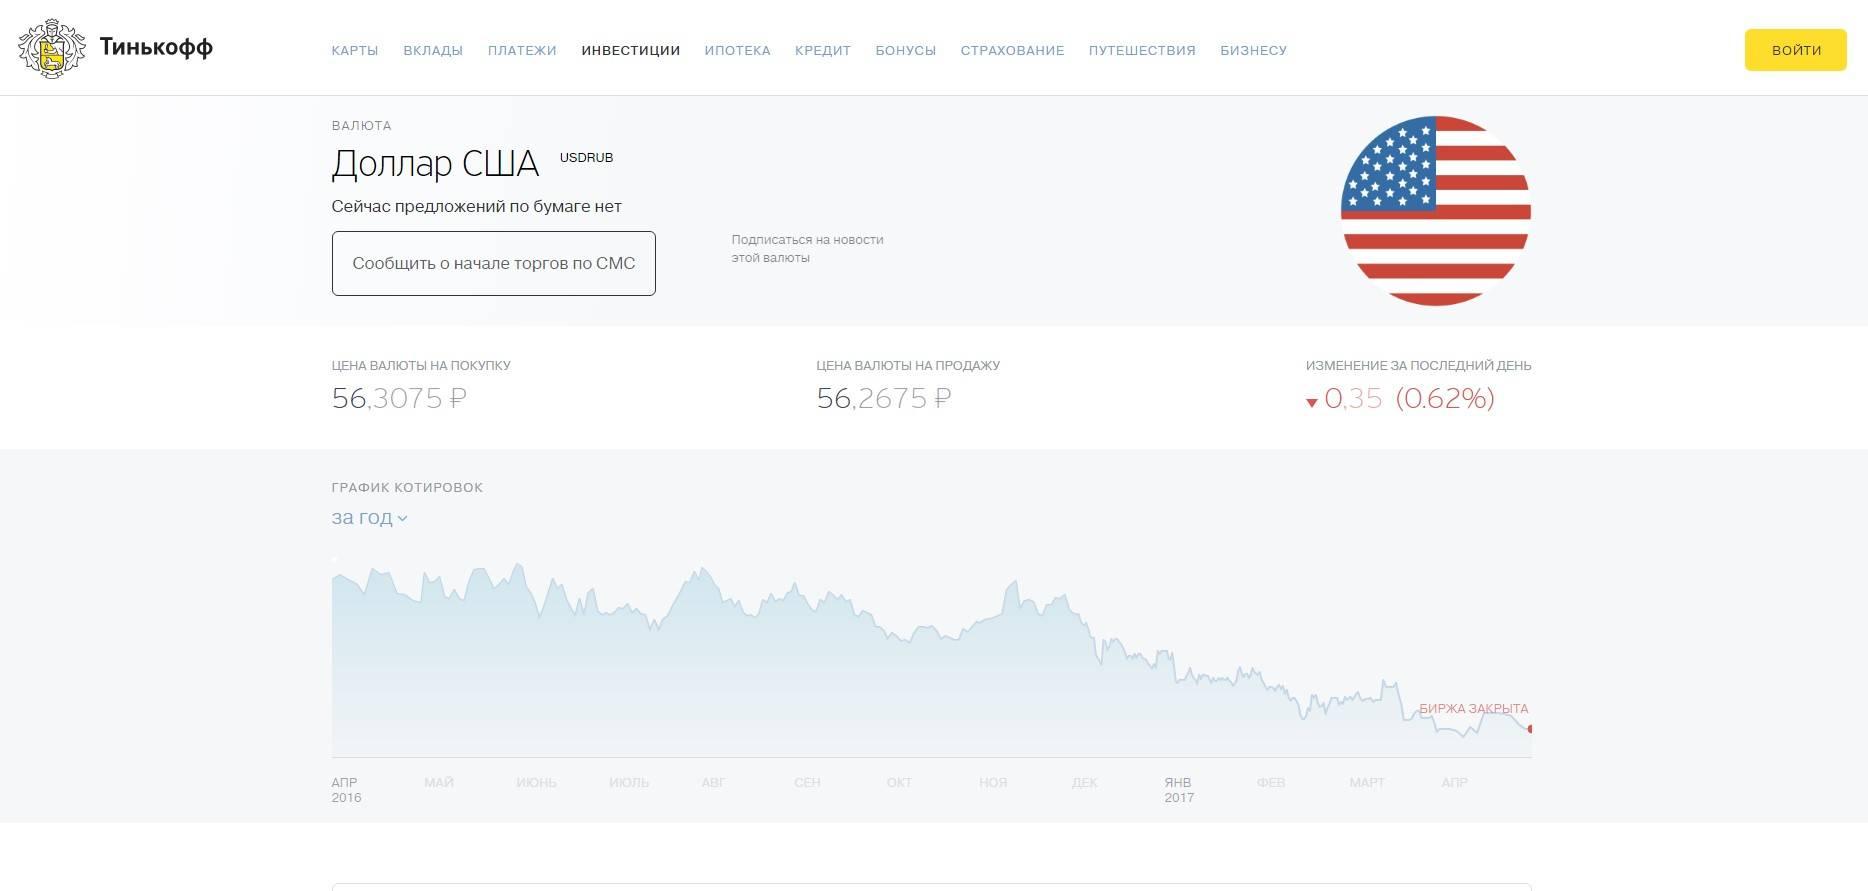 курсы валют в тинькофф банке онлайн